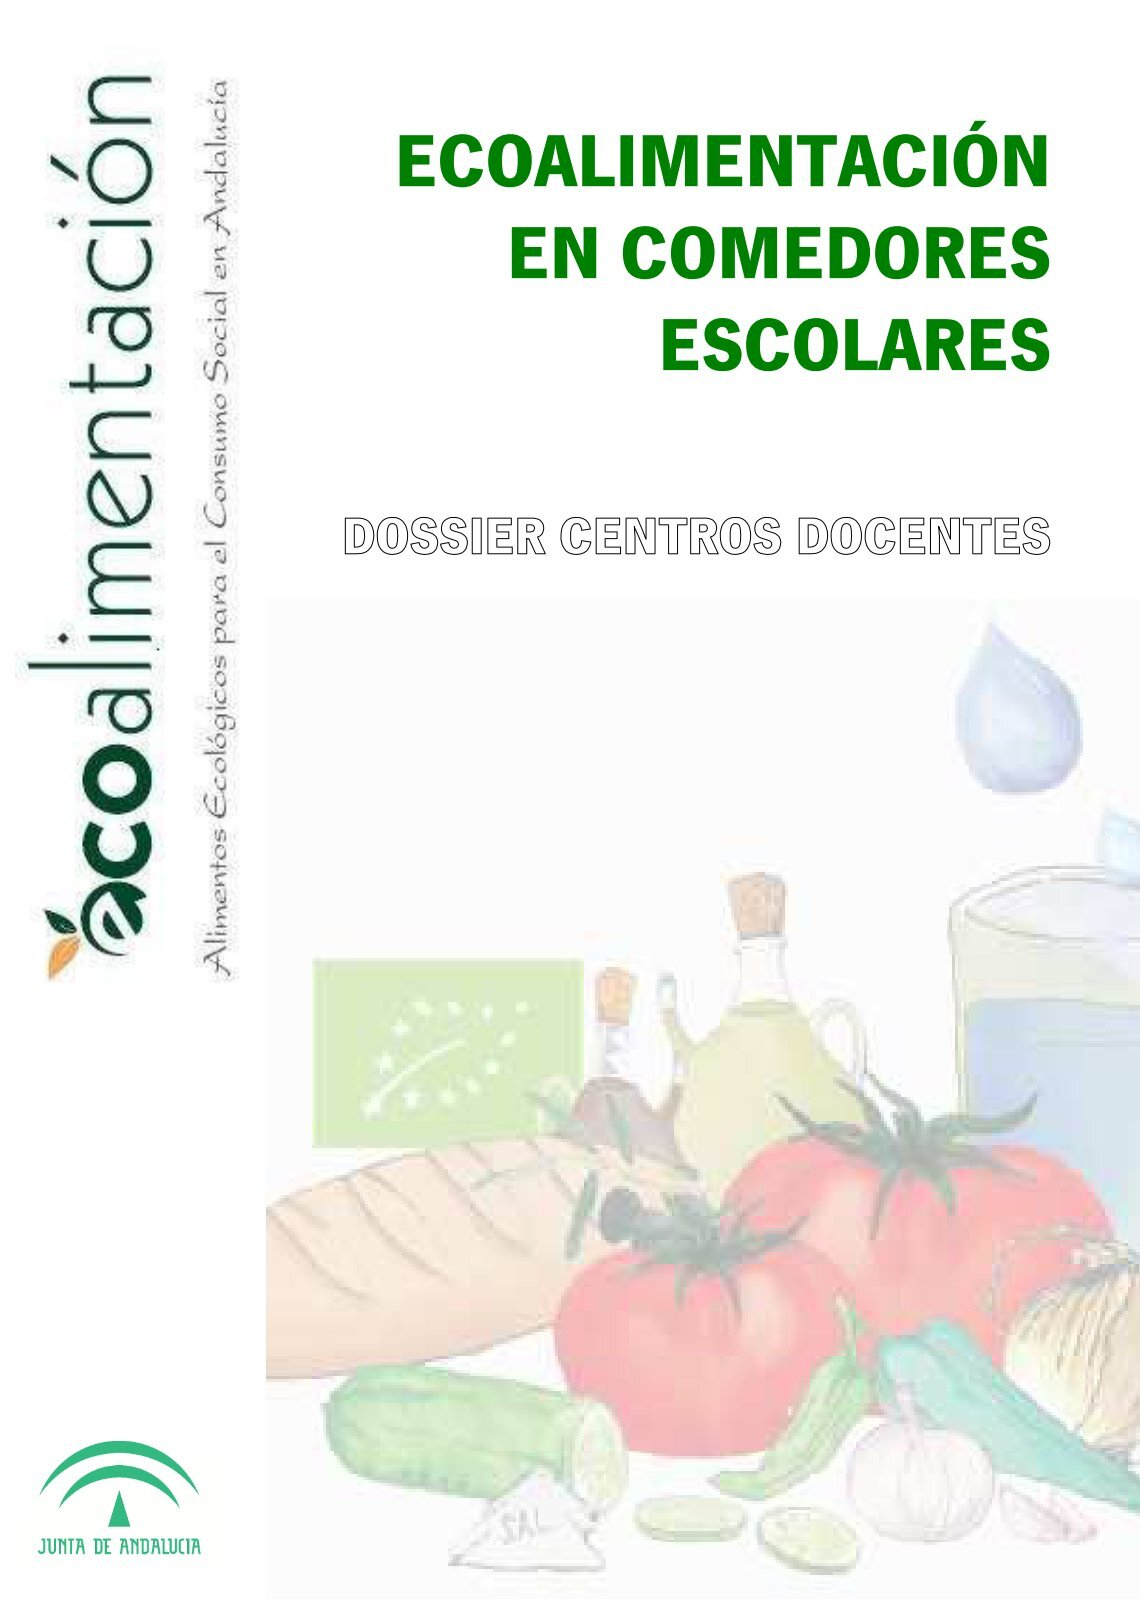 1 free Magazines from LNX.EDUCACIONENMALAGA.ES